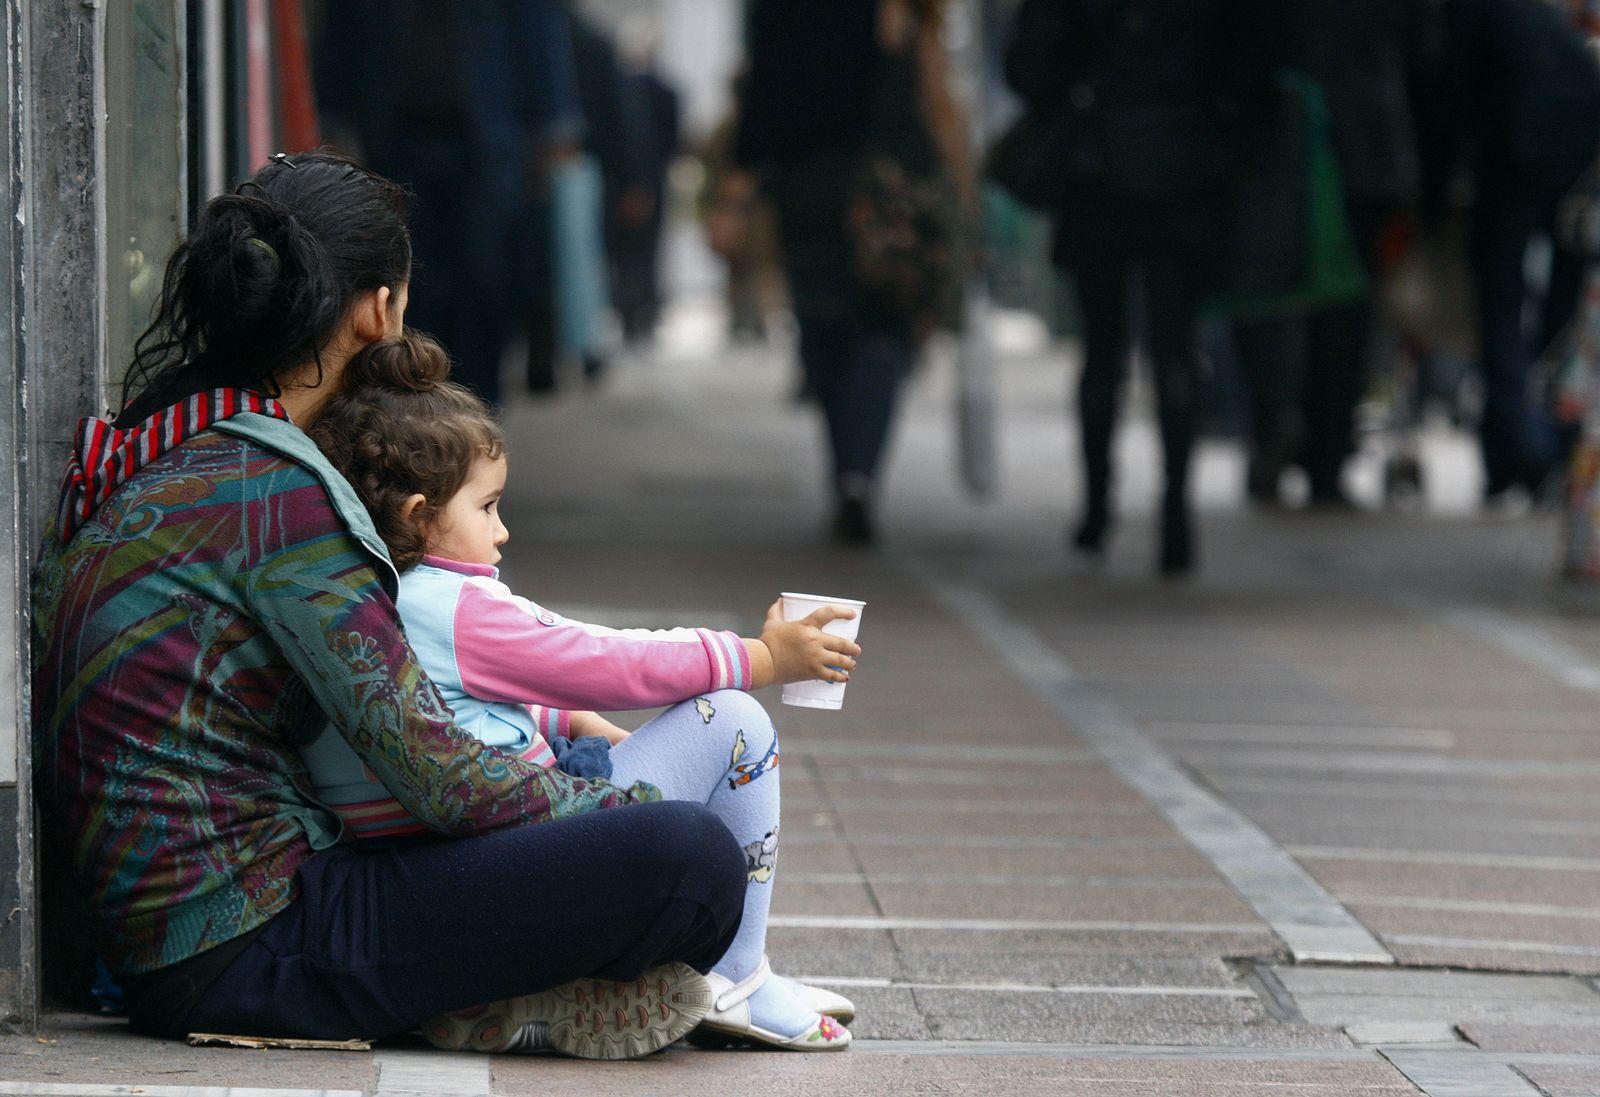 Griechenland / Armut